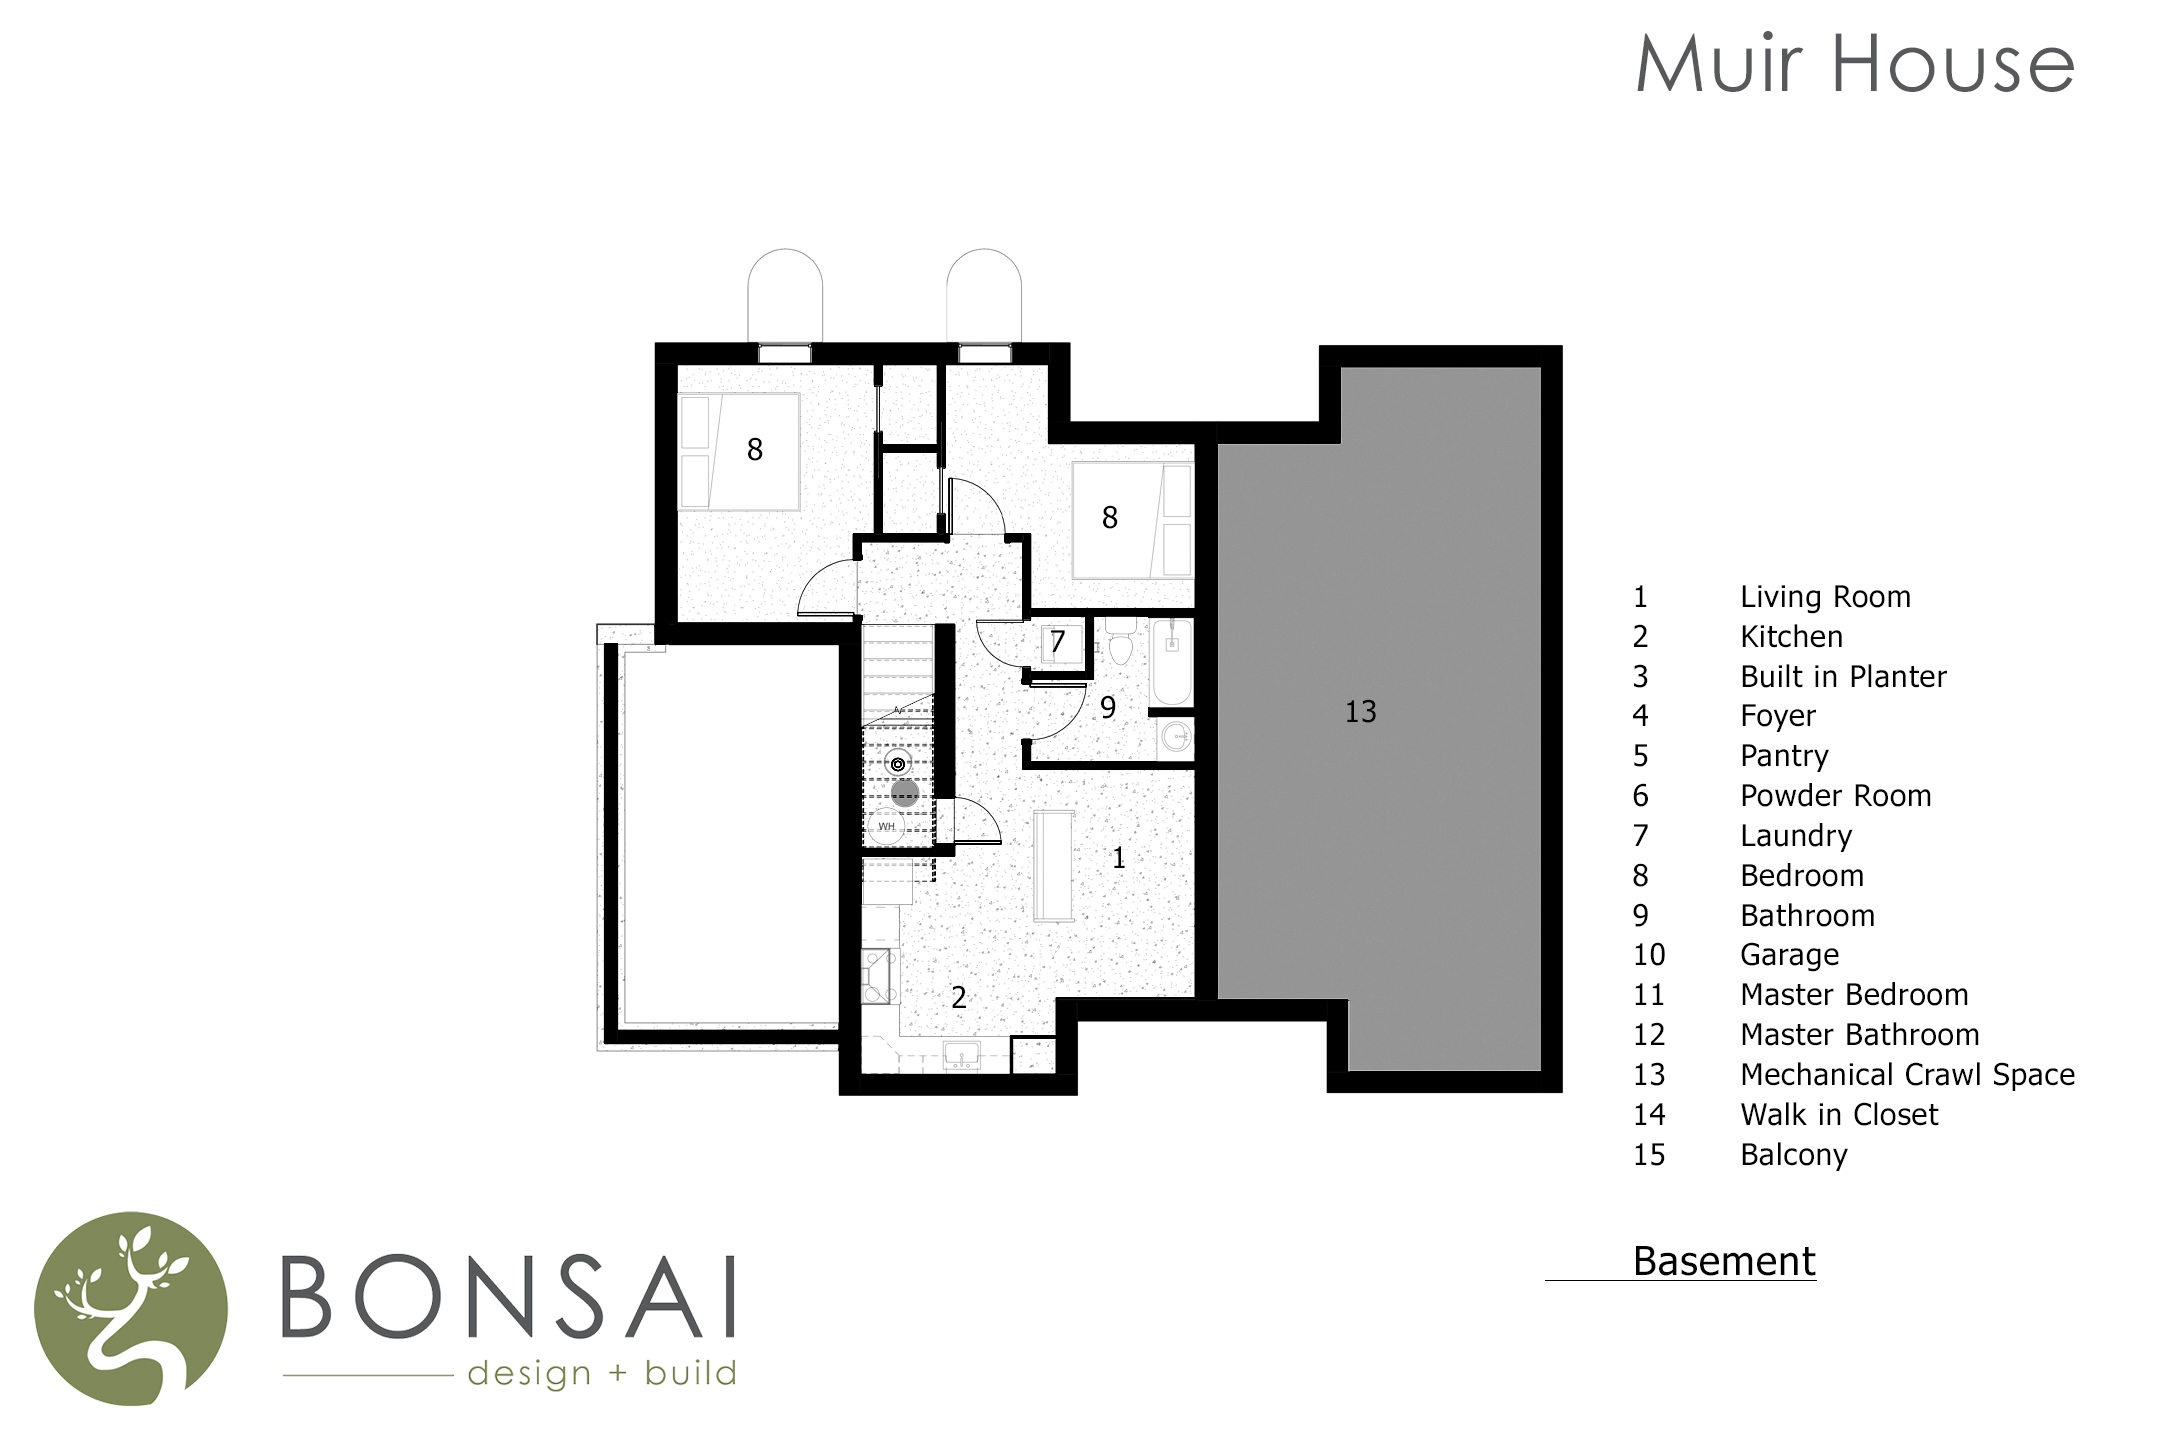 Muir House Basement Floor Plan.jpg